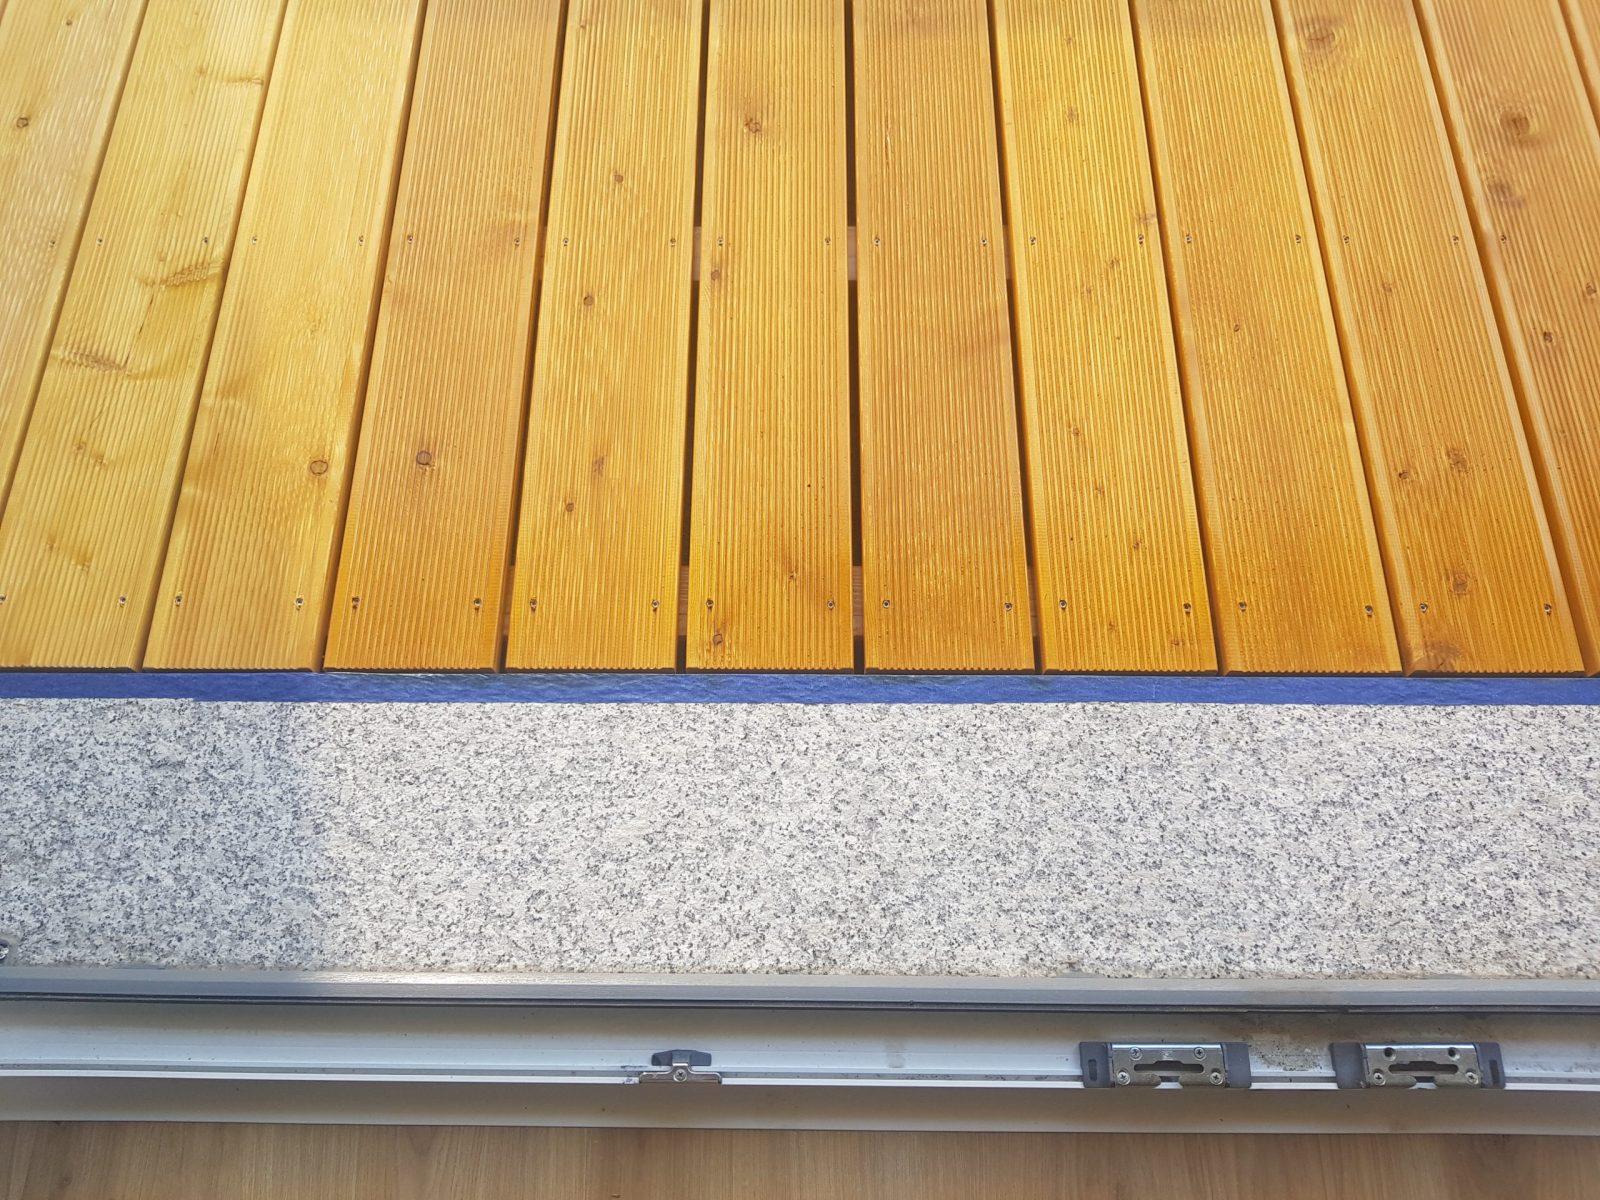 Deski tarasowe drewniane